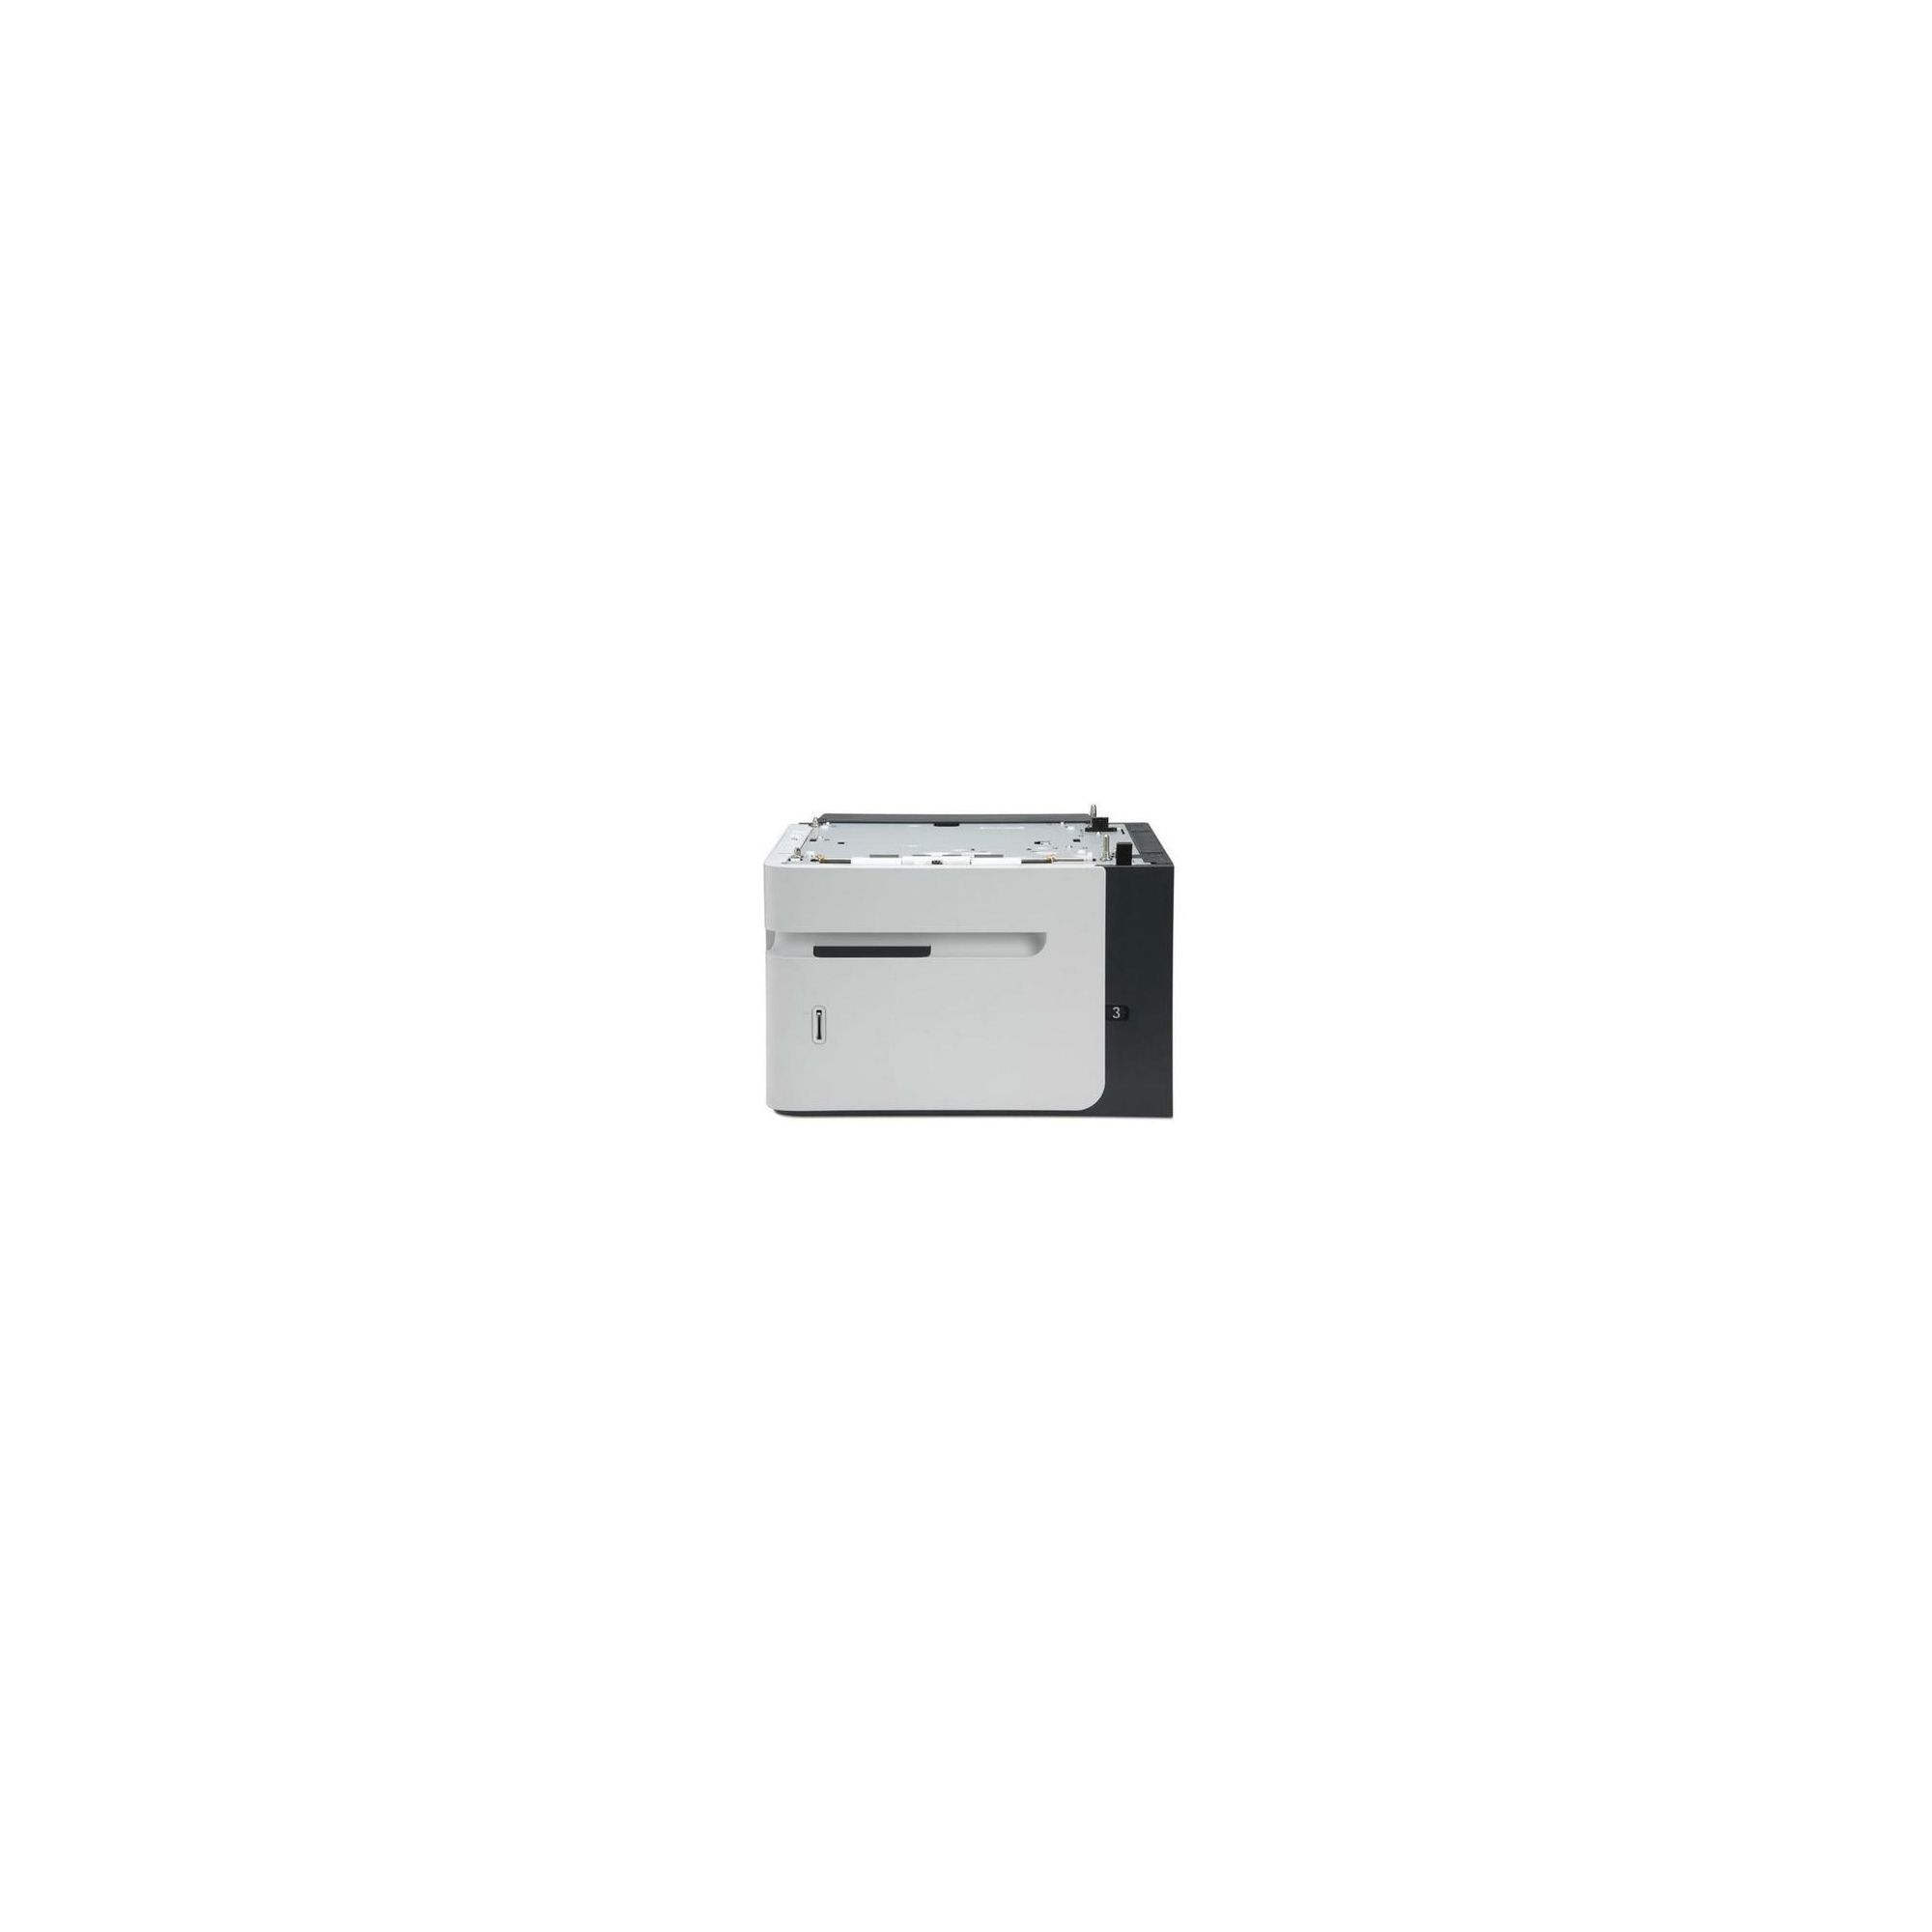 HP Q2444B 1500 Sheet High Capacity Tray for LaserJet 4250 4350 Printers at Tesco Direct